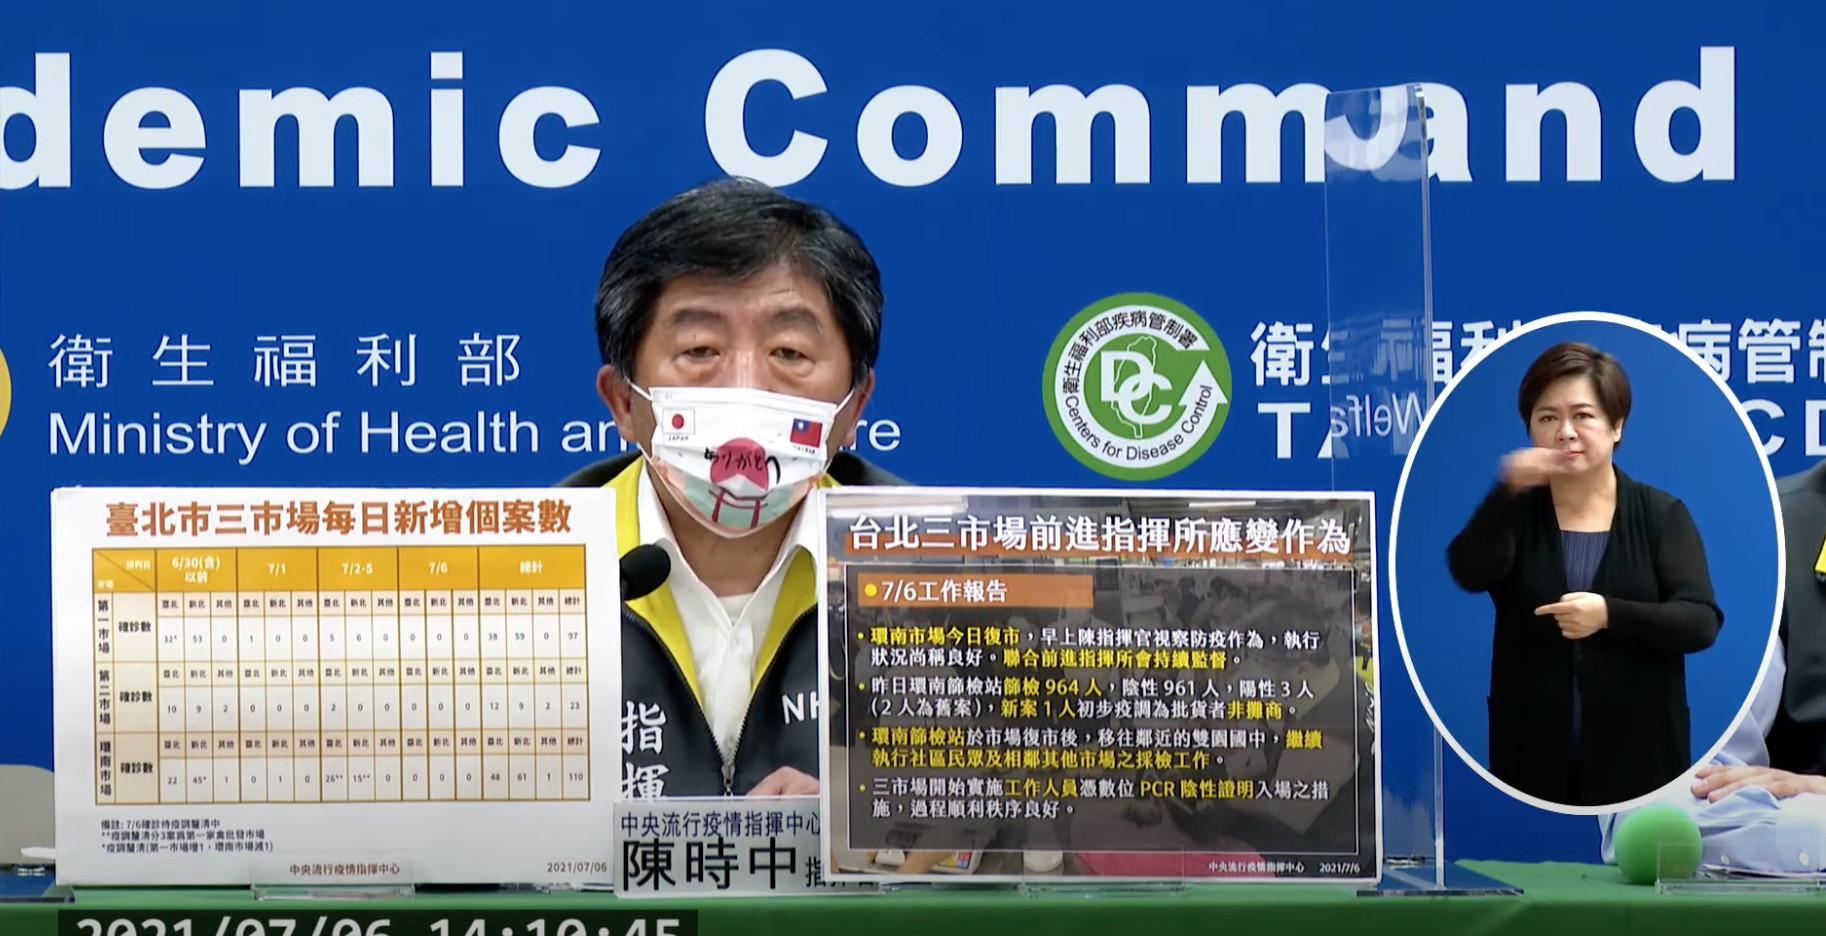 ET民調,2022,台北市長,黃珊珊,蔣萬安,陳時中,防疫,疫苗